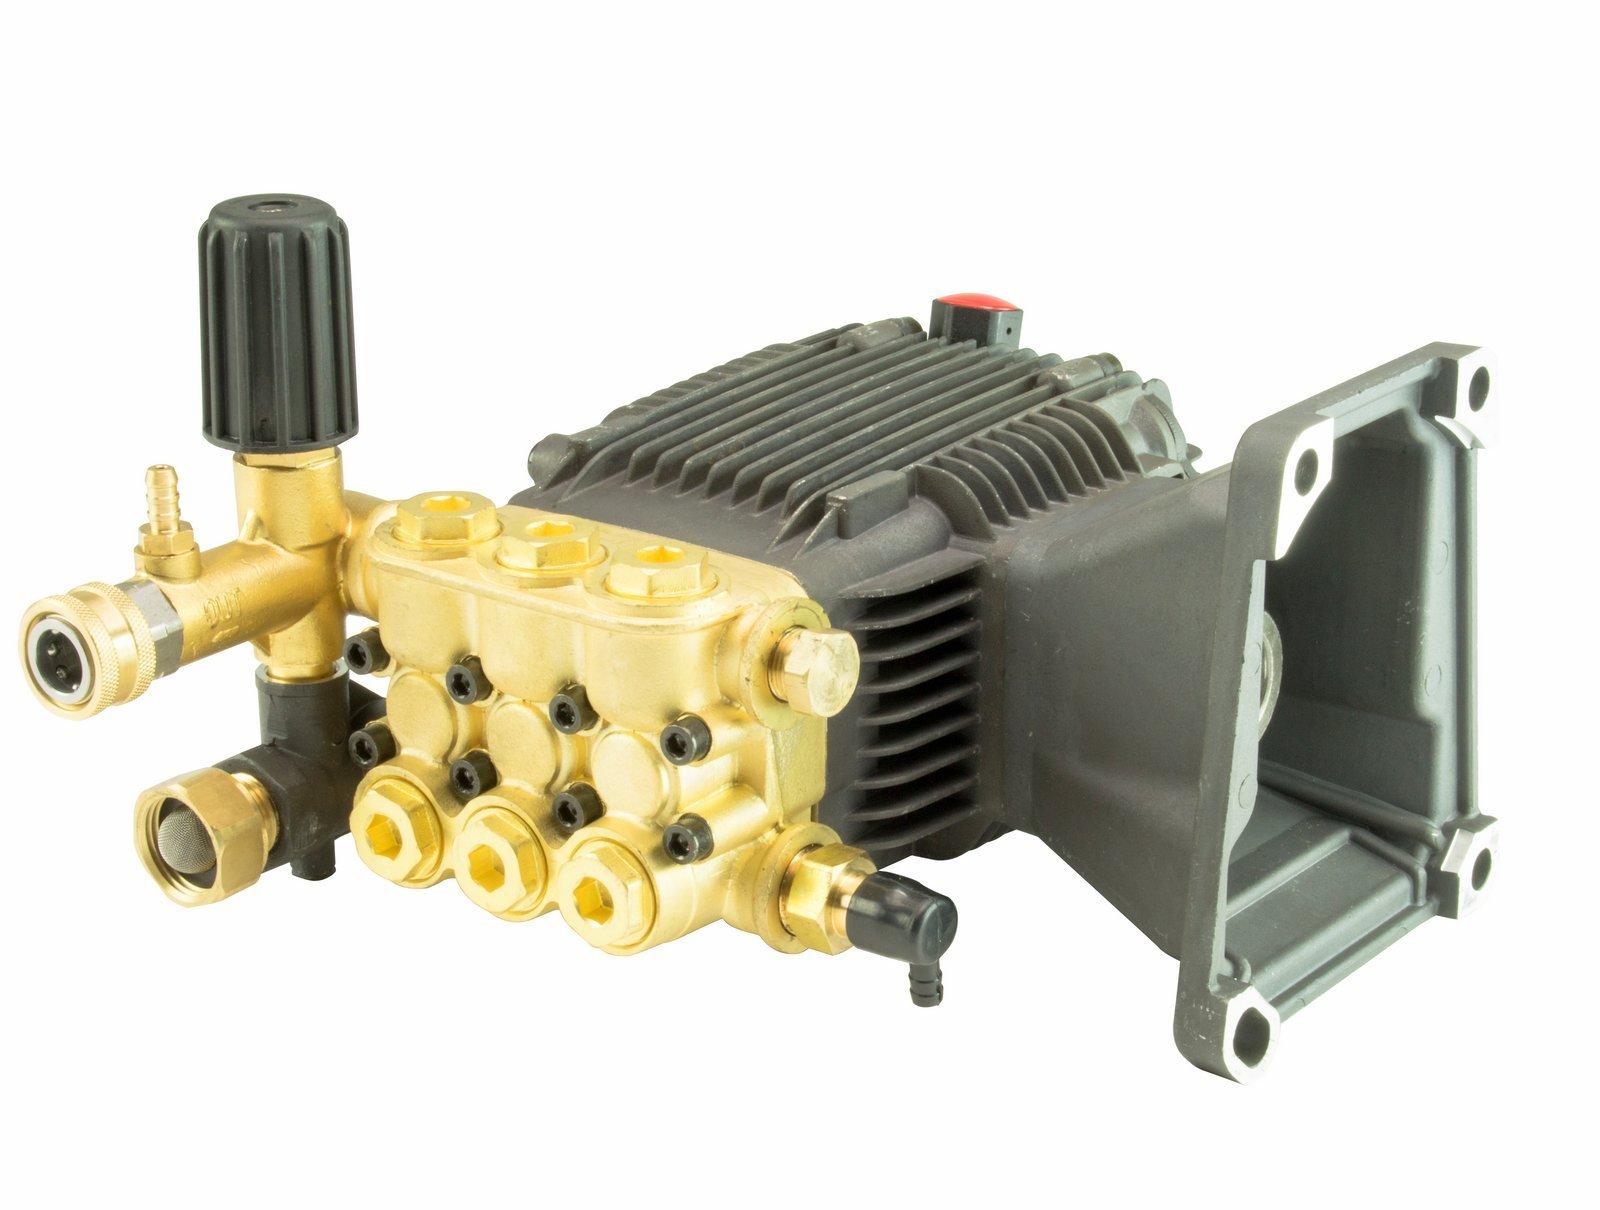 Erie Tools Triplex Pressure Washer Pump for Cat General AR, 5.7 GPM, 3200 PSI